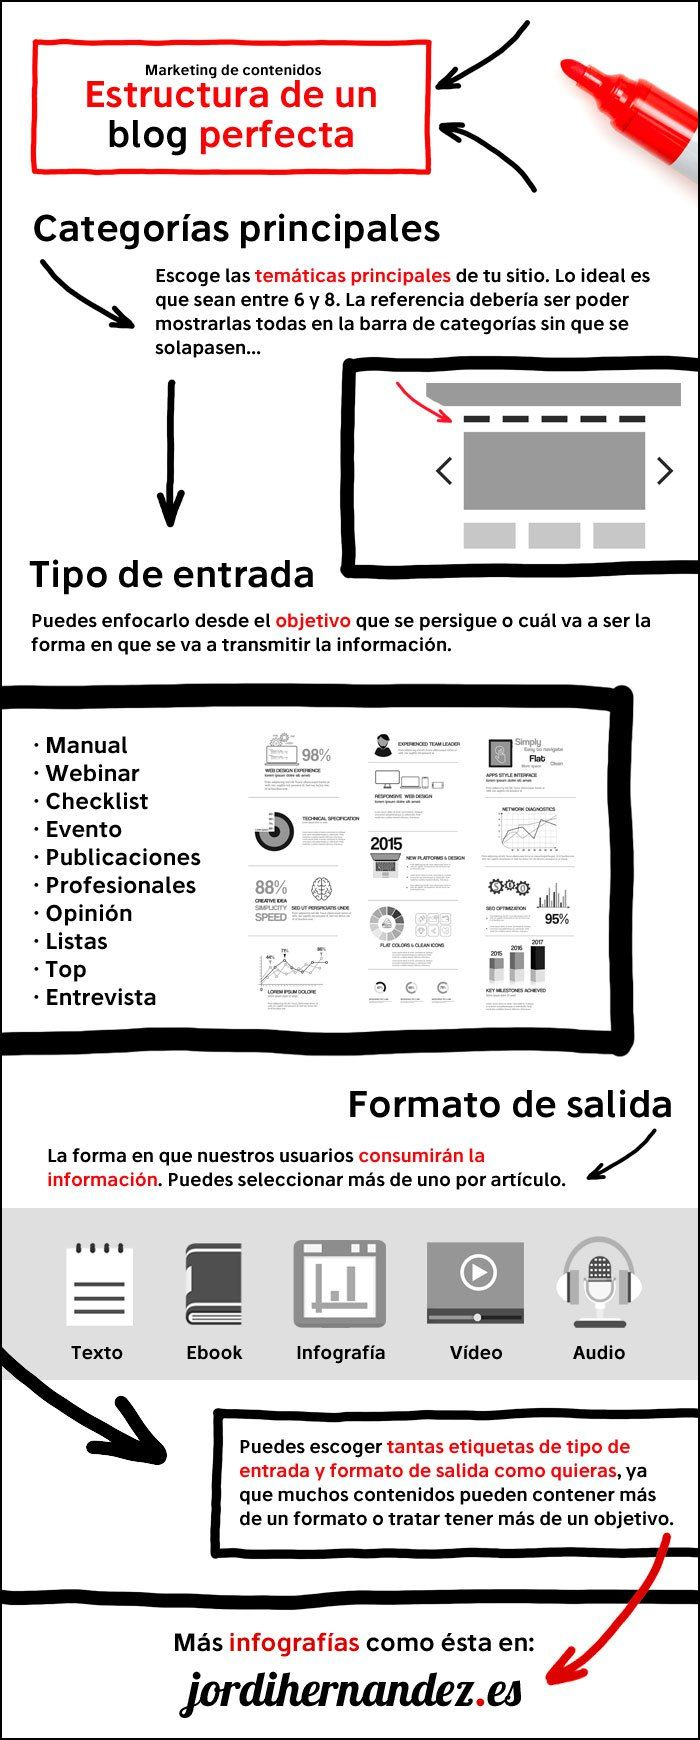 Cómo debe ser la Estructura perfecta de un Blog #infografia #infographic #socialmedia